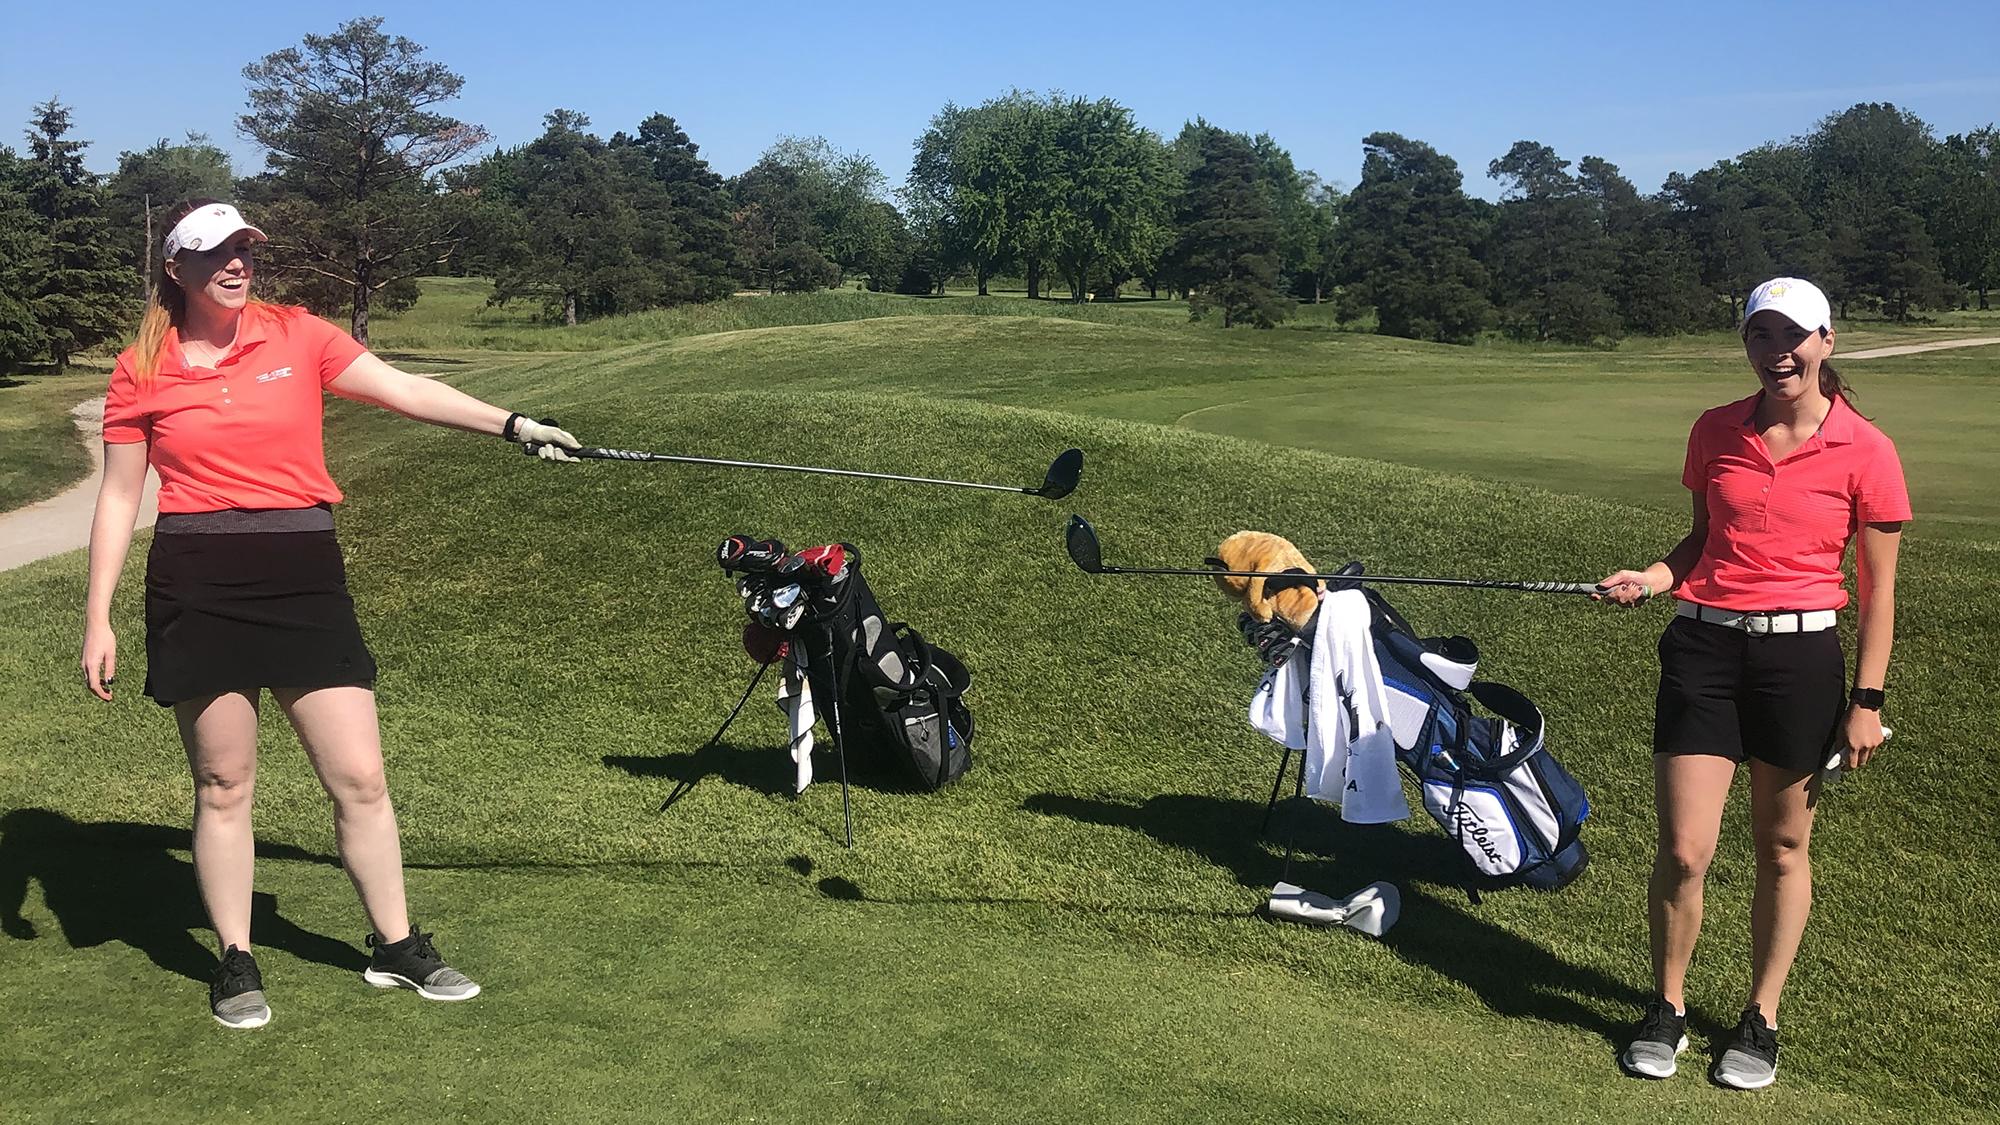 Female golfers. Emily and Steph